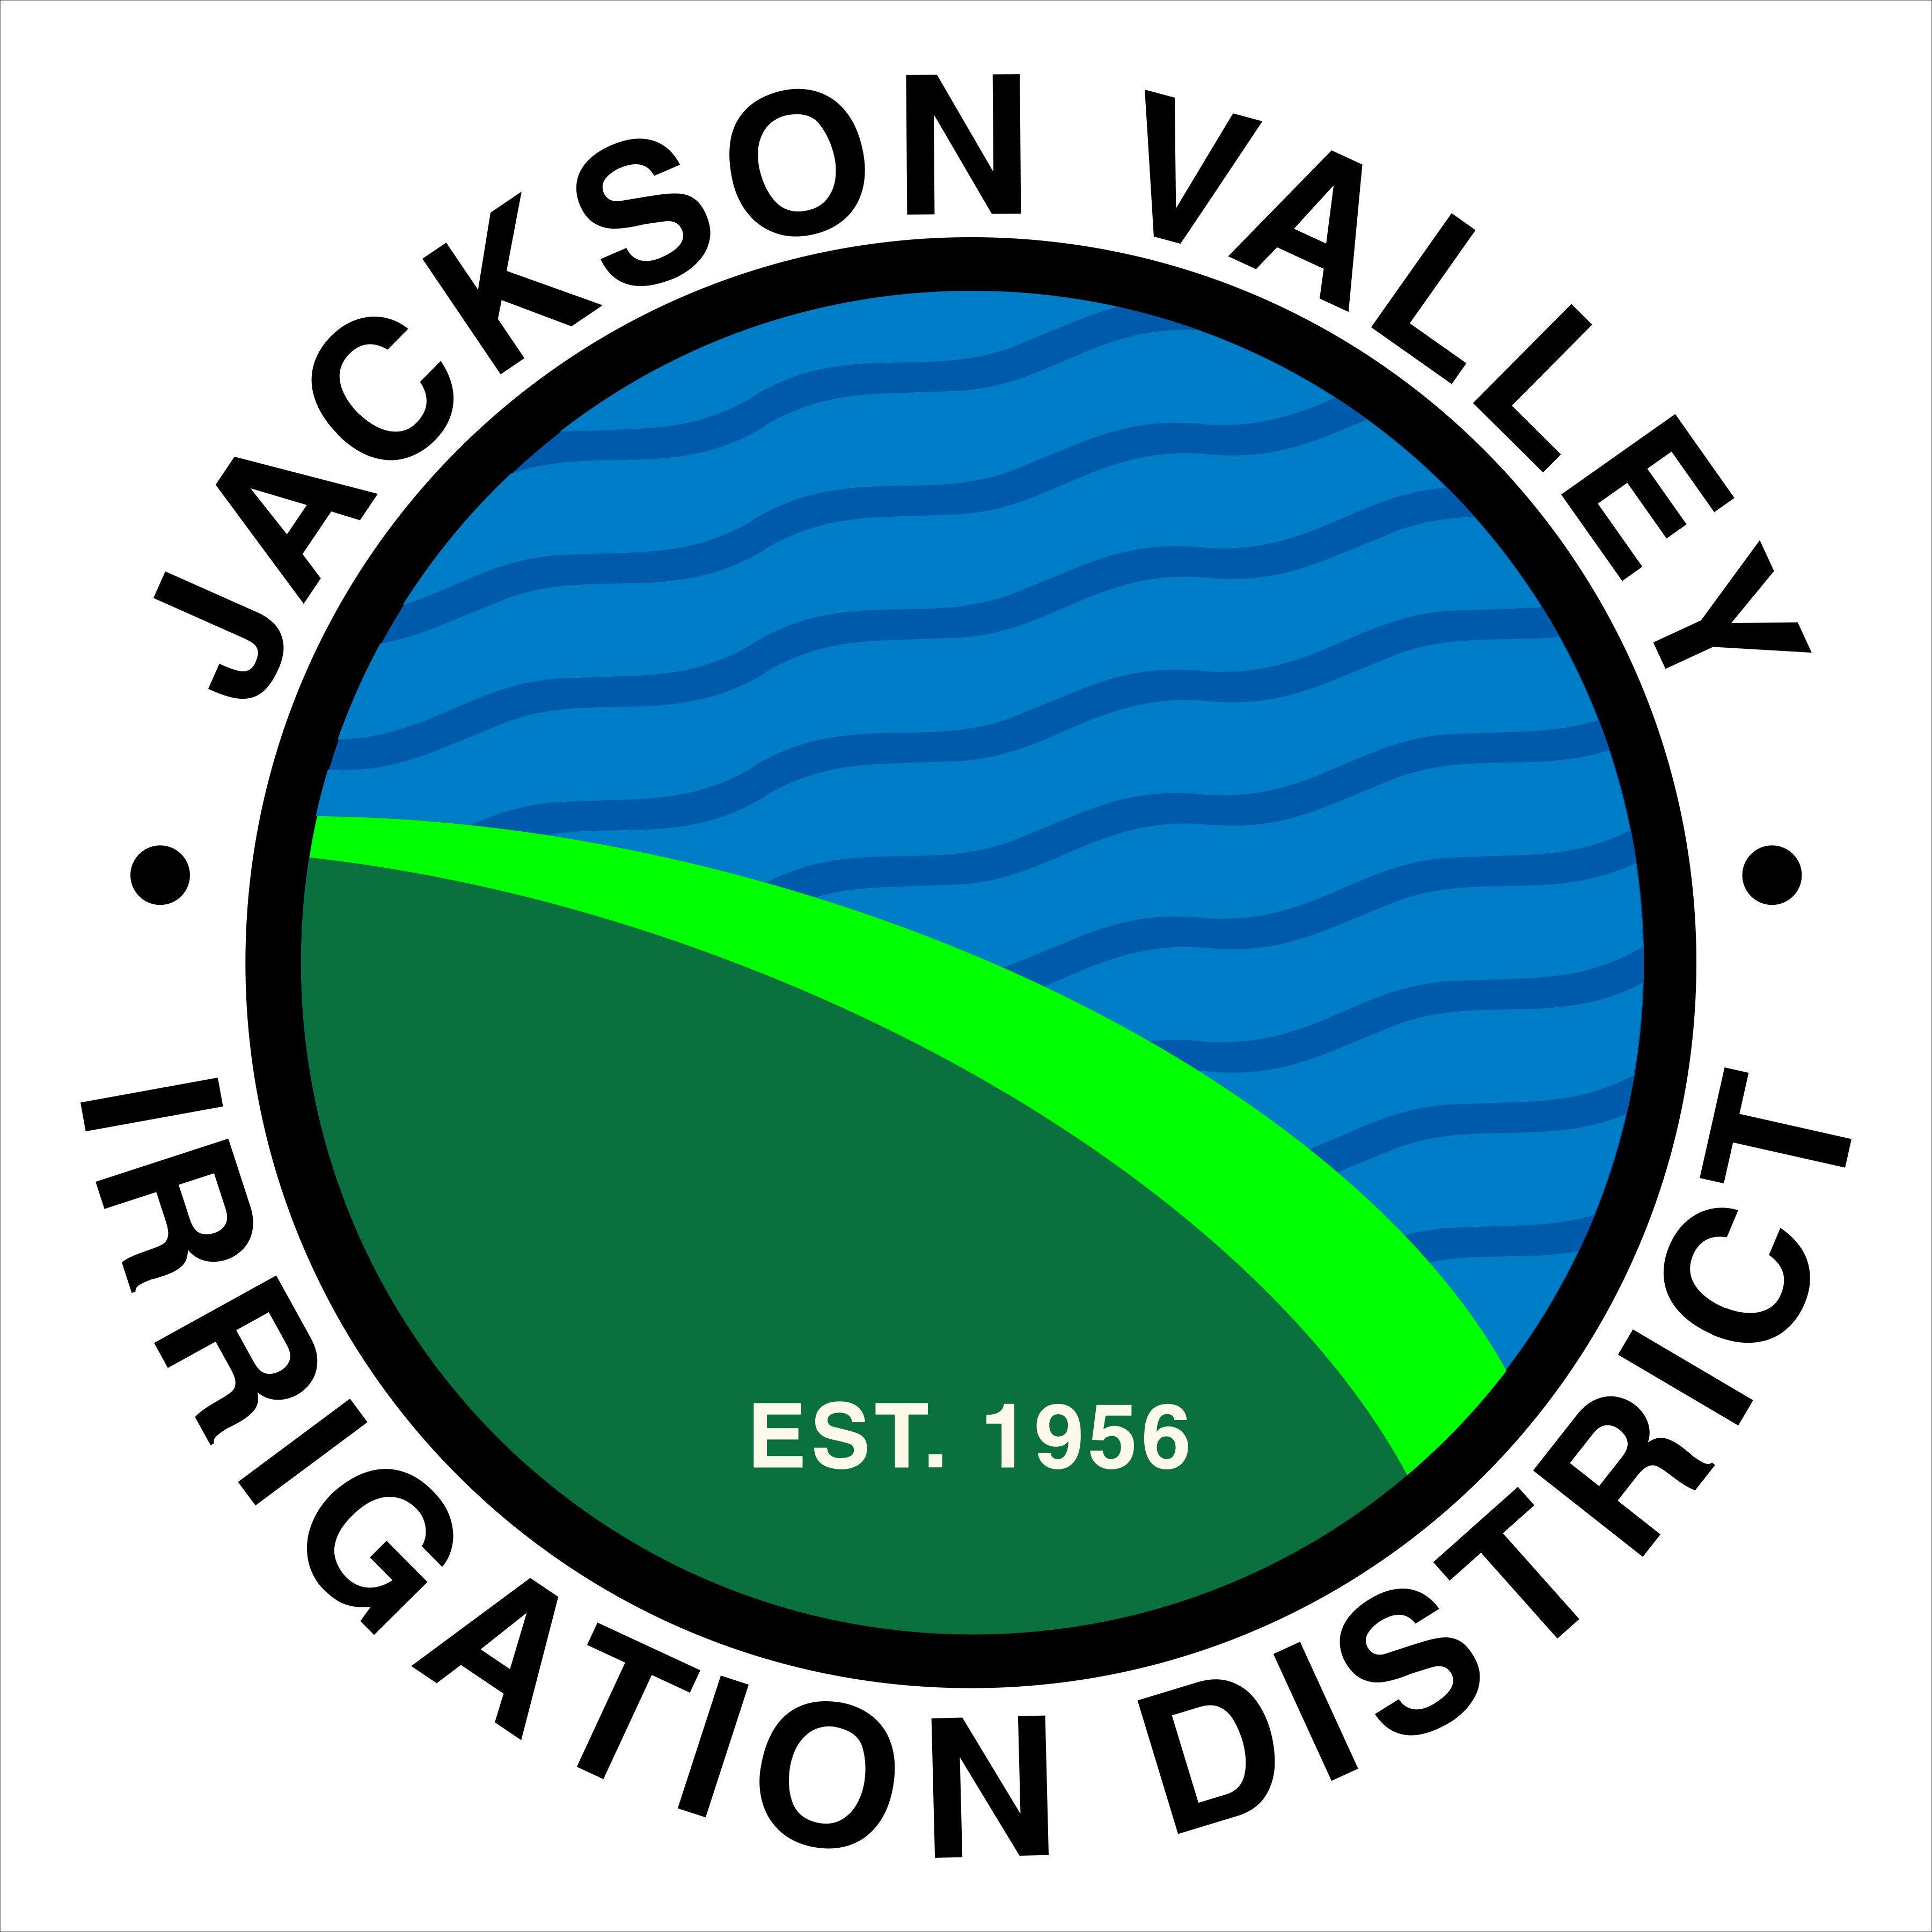 Jackson Valley Irrigation District